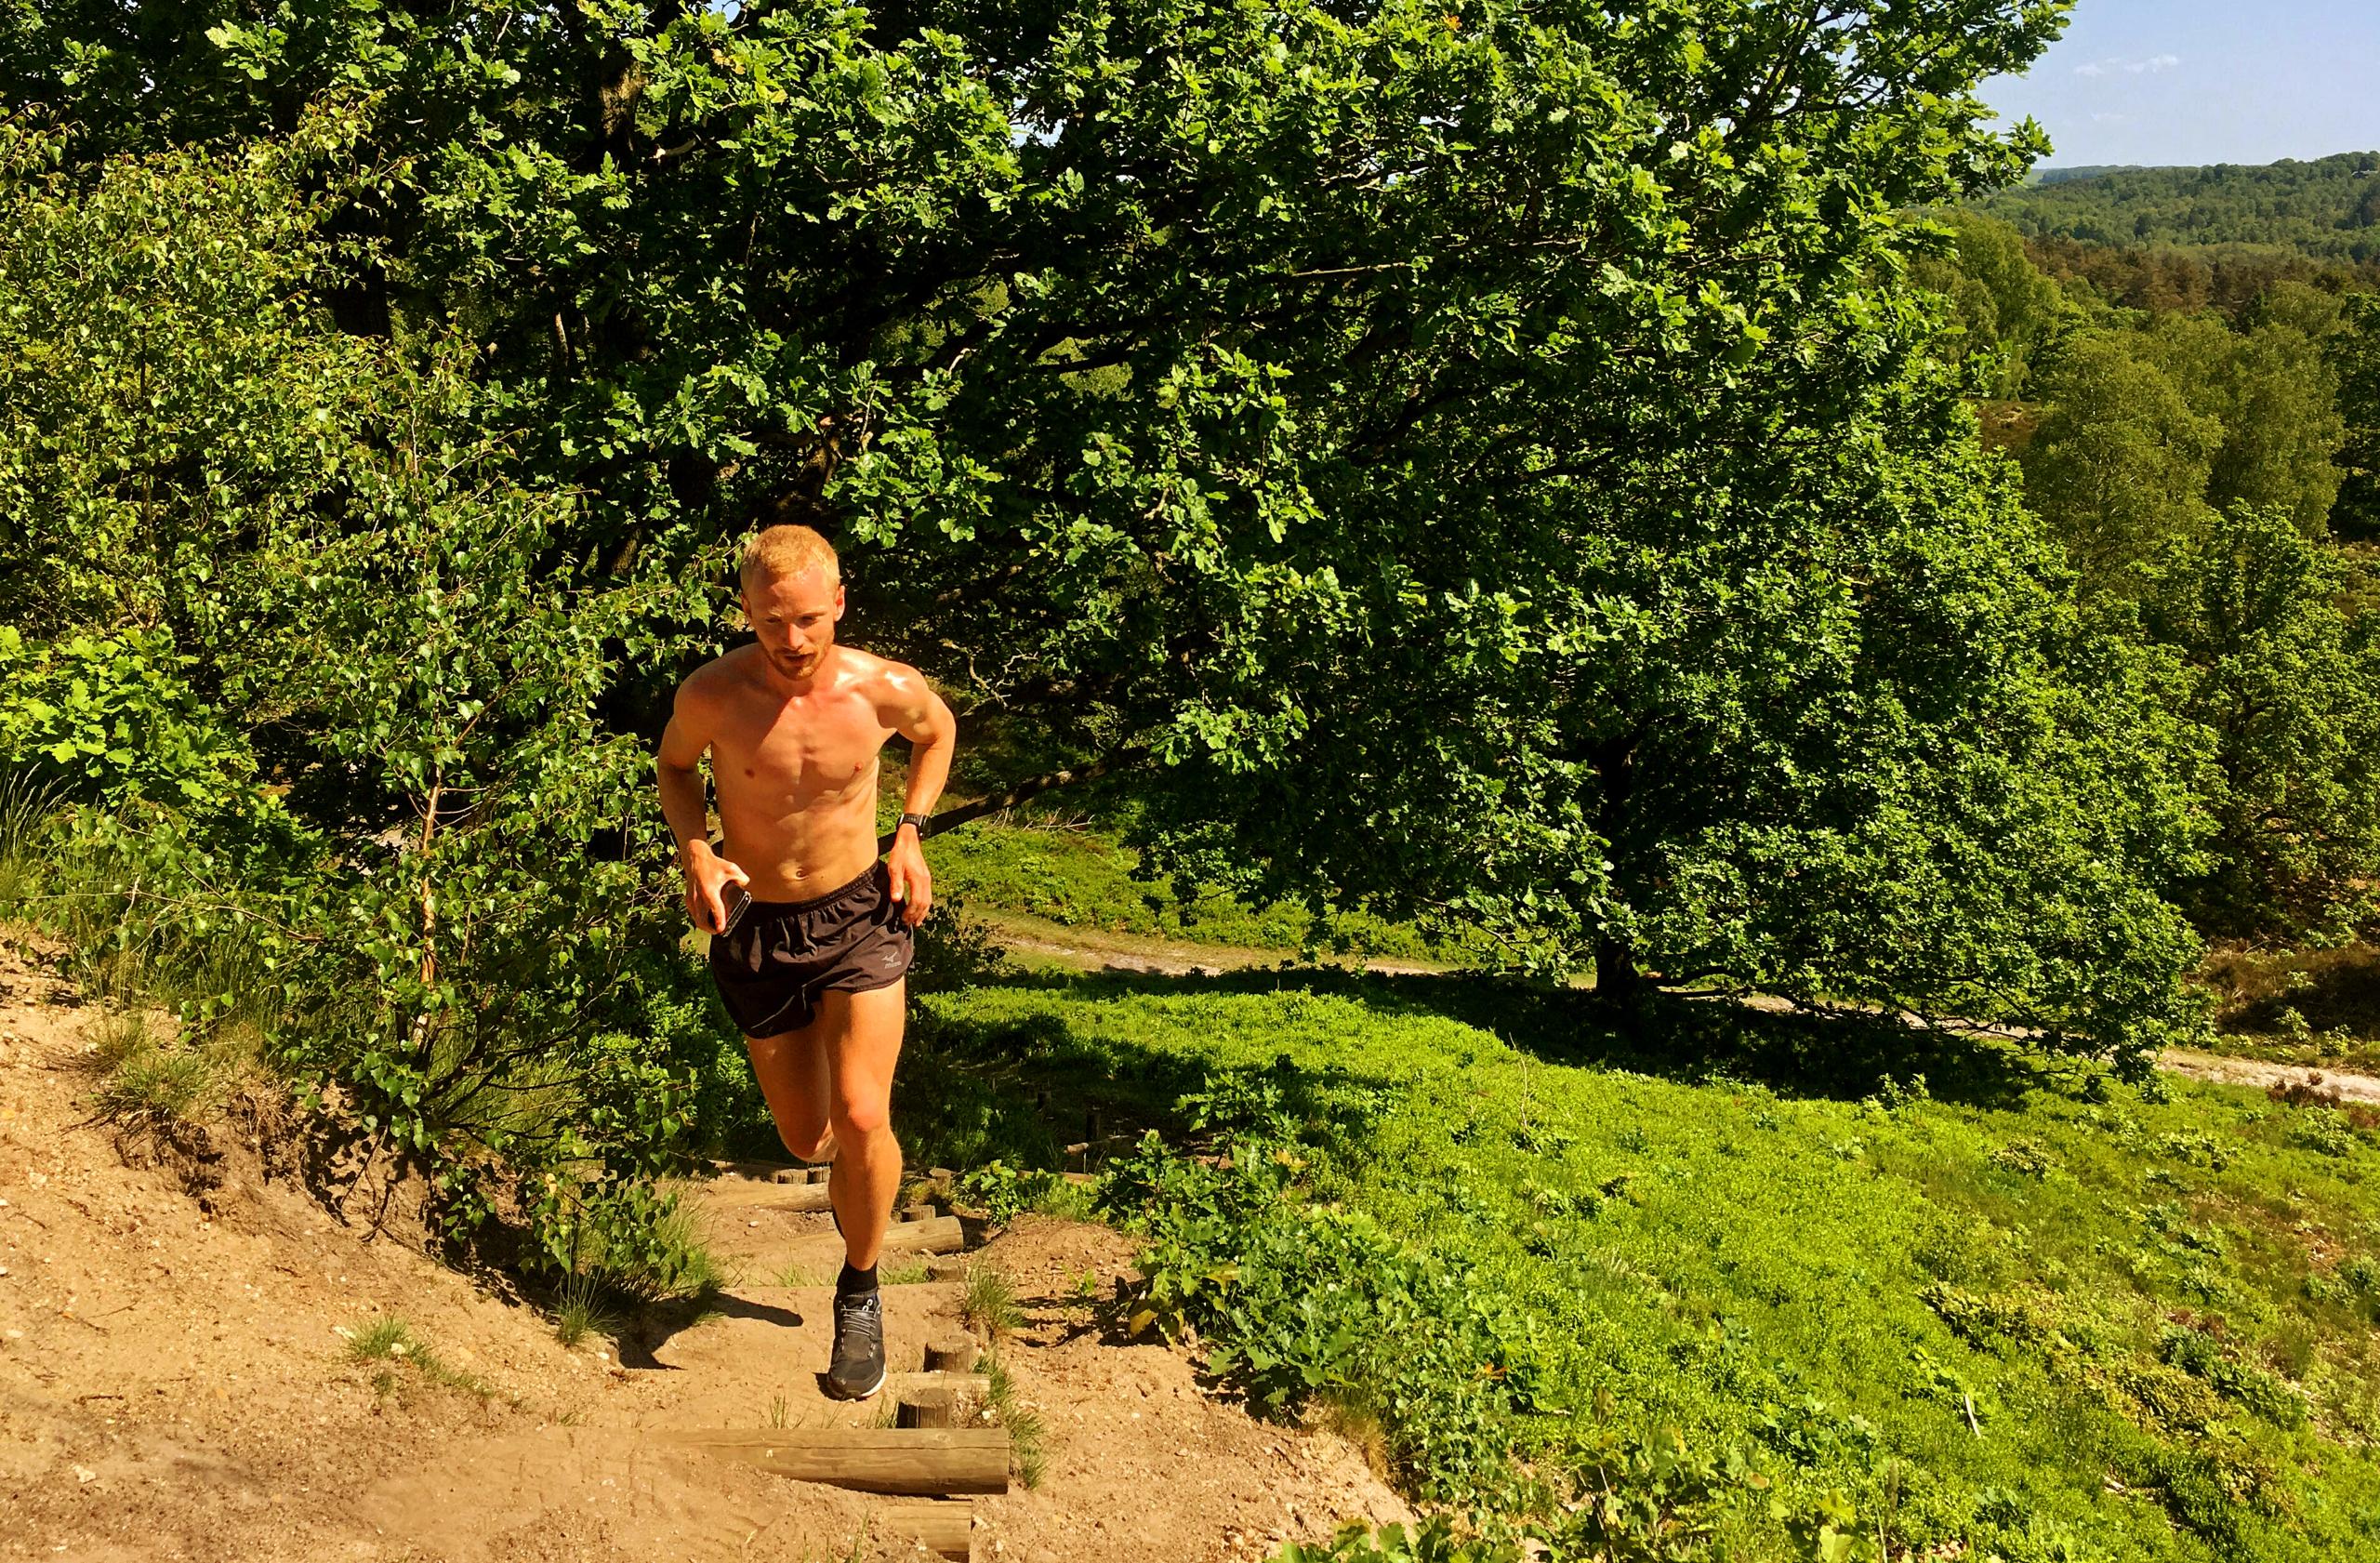 Anders Aa. hansen trailløber og ultraløber